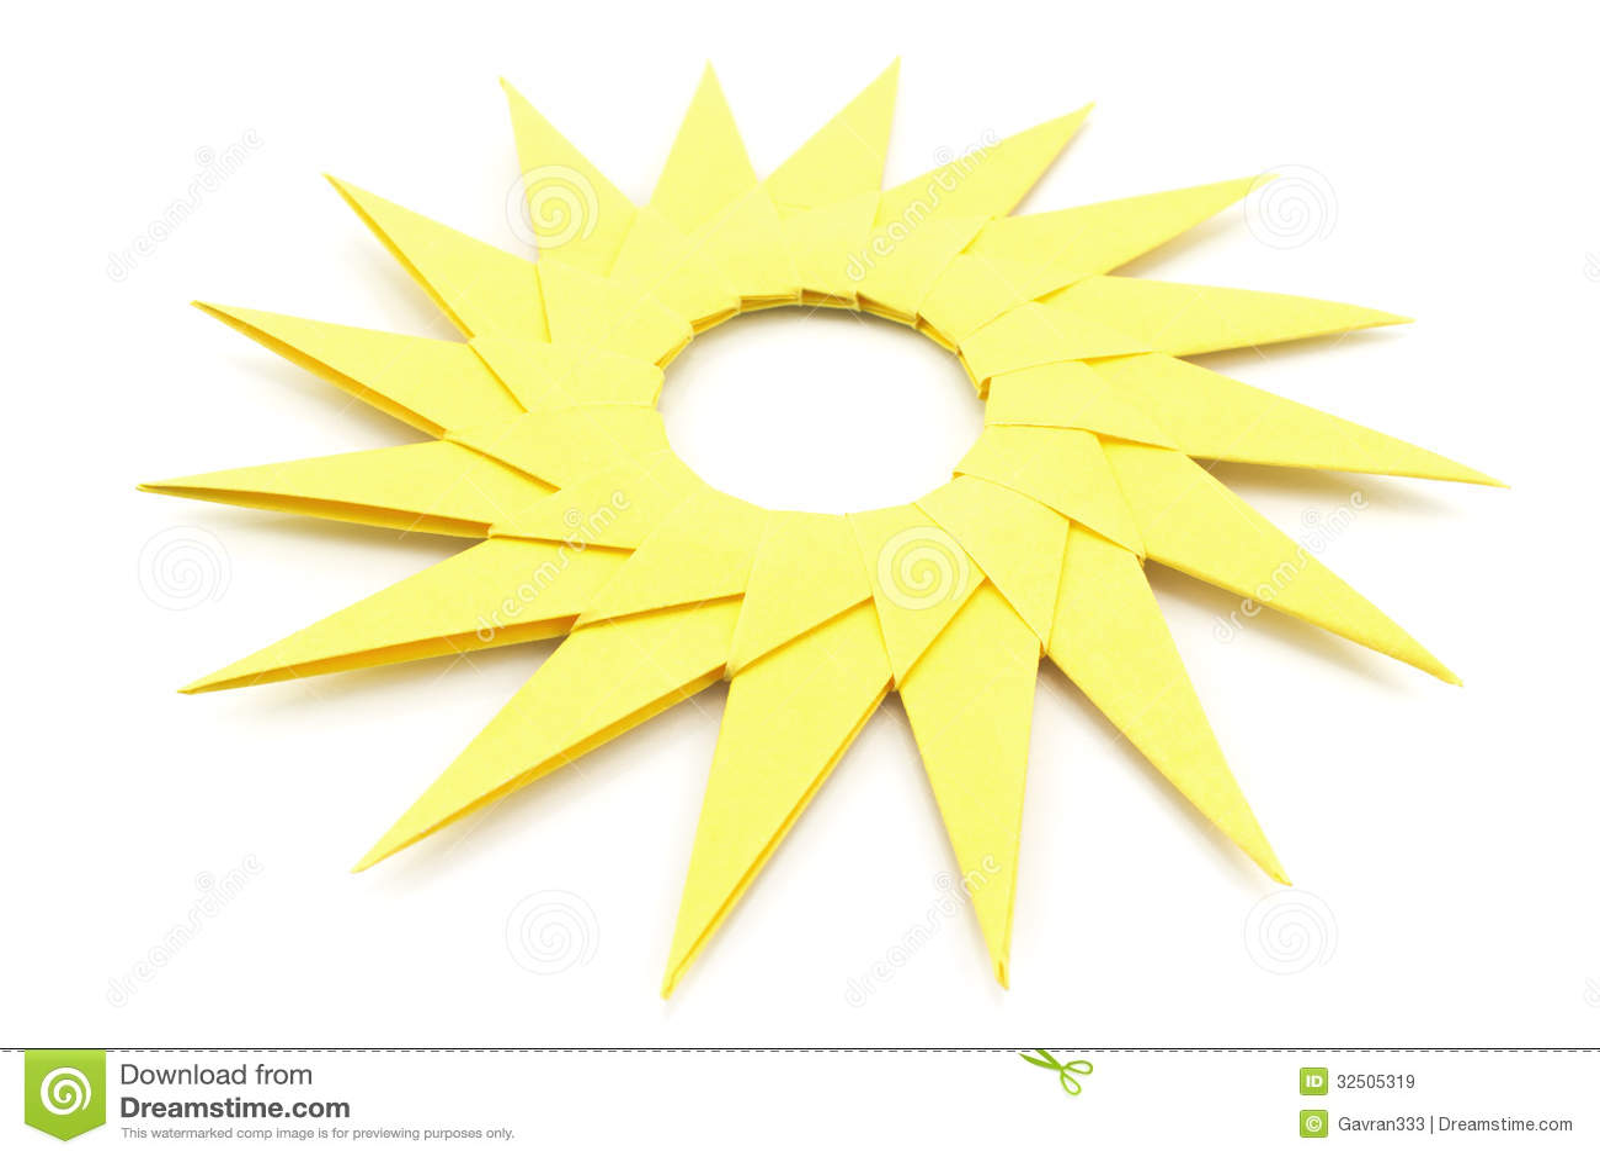 no ordinary sun essay